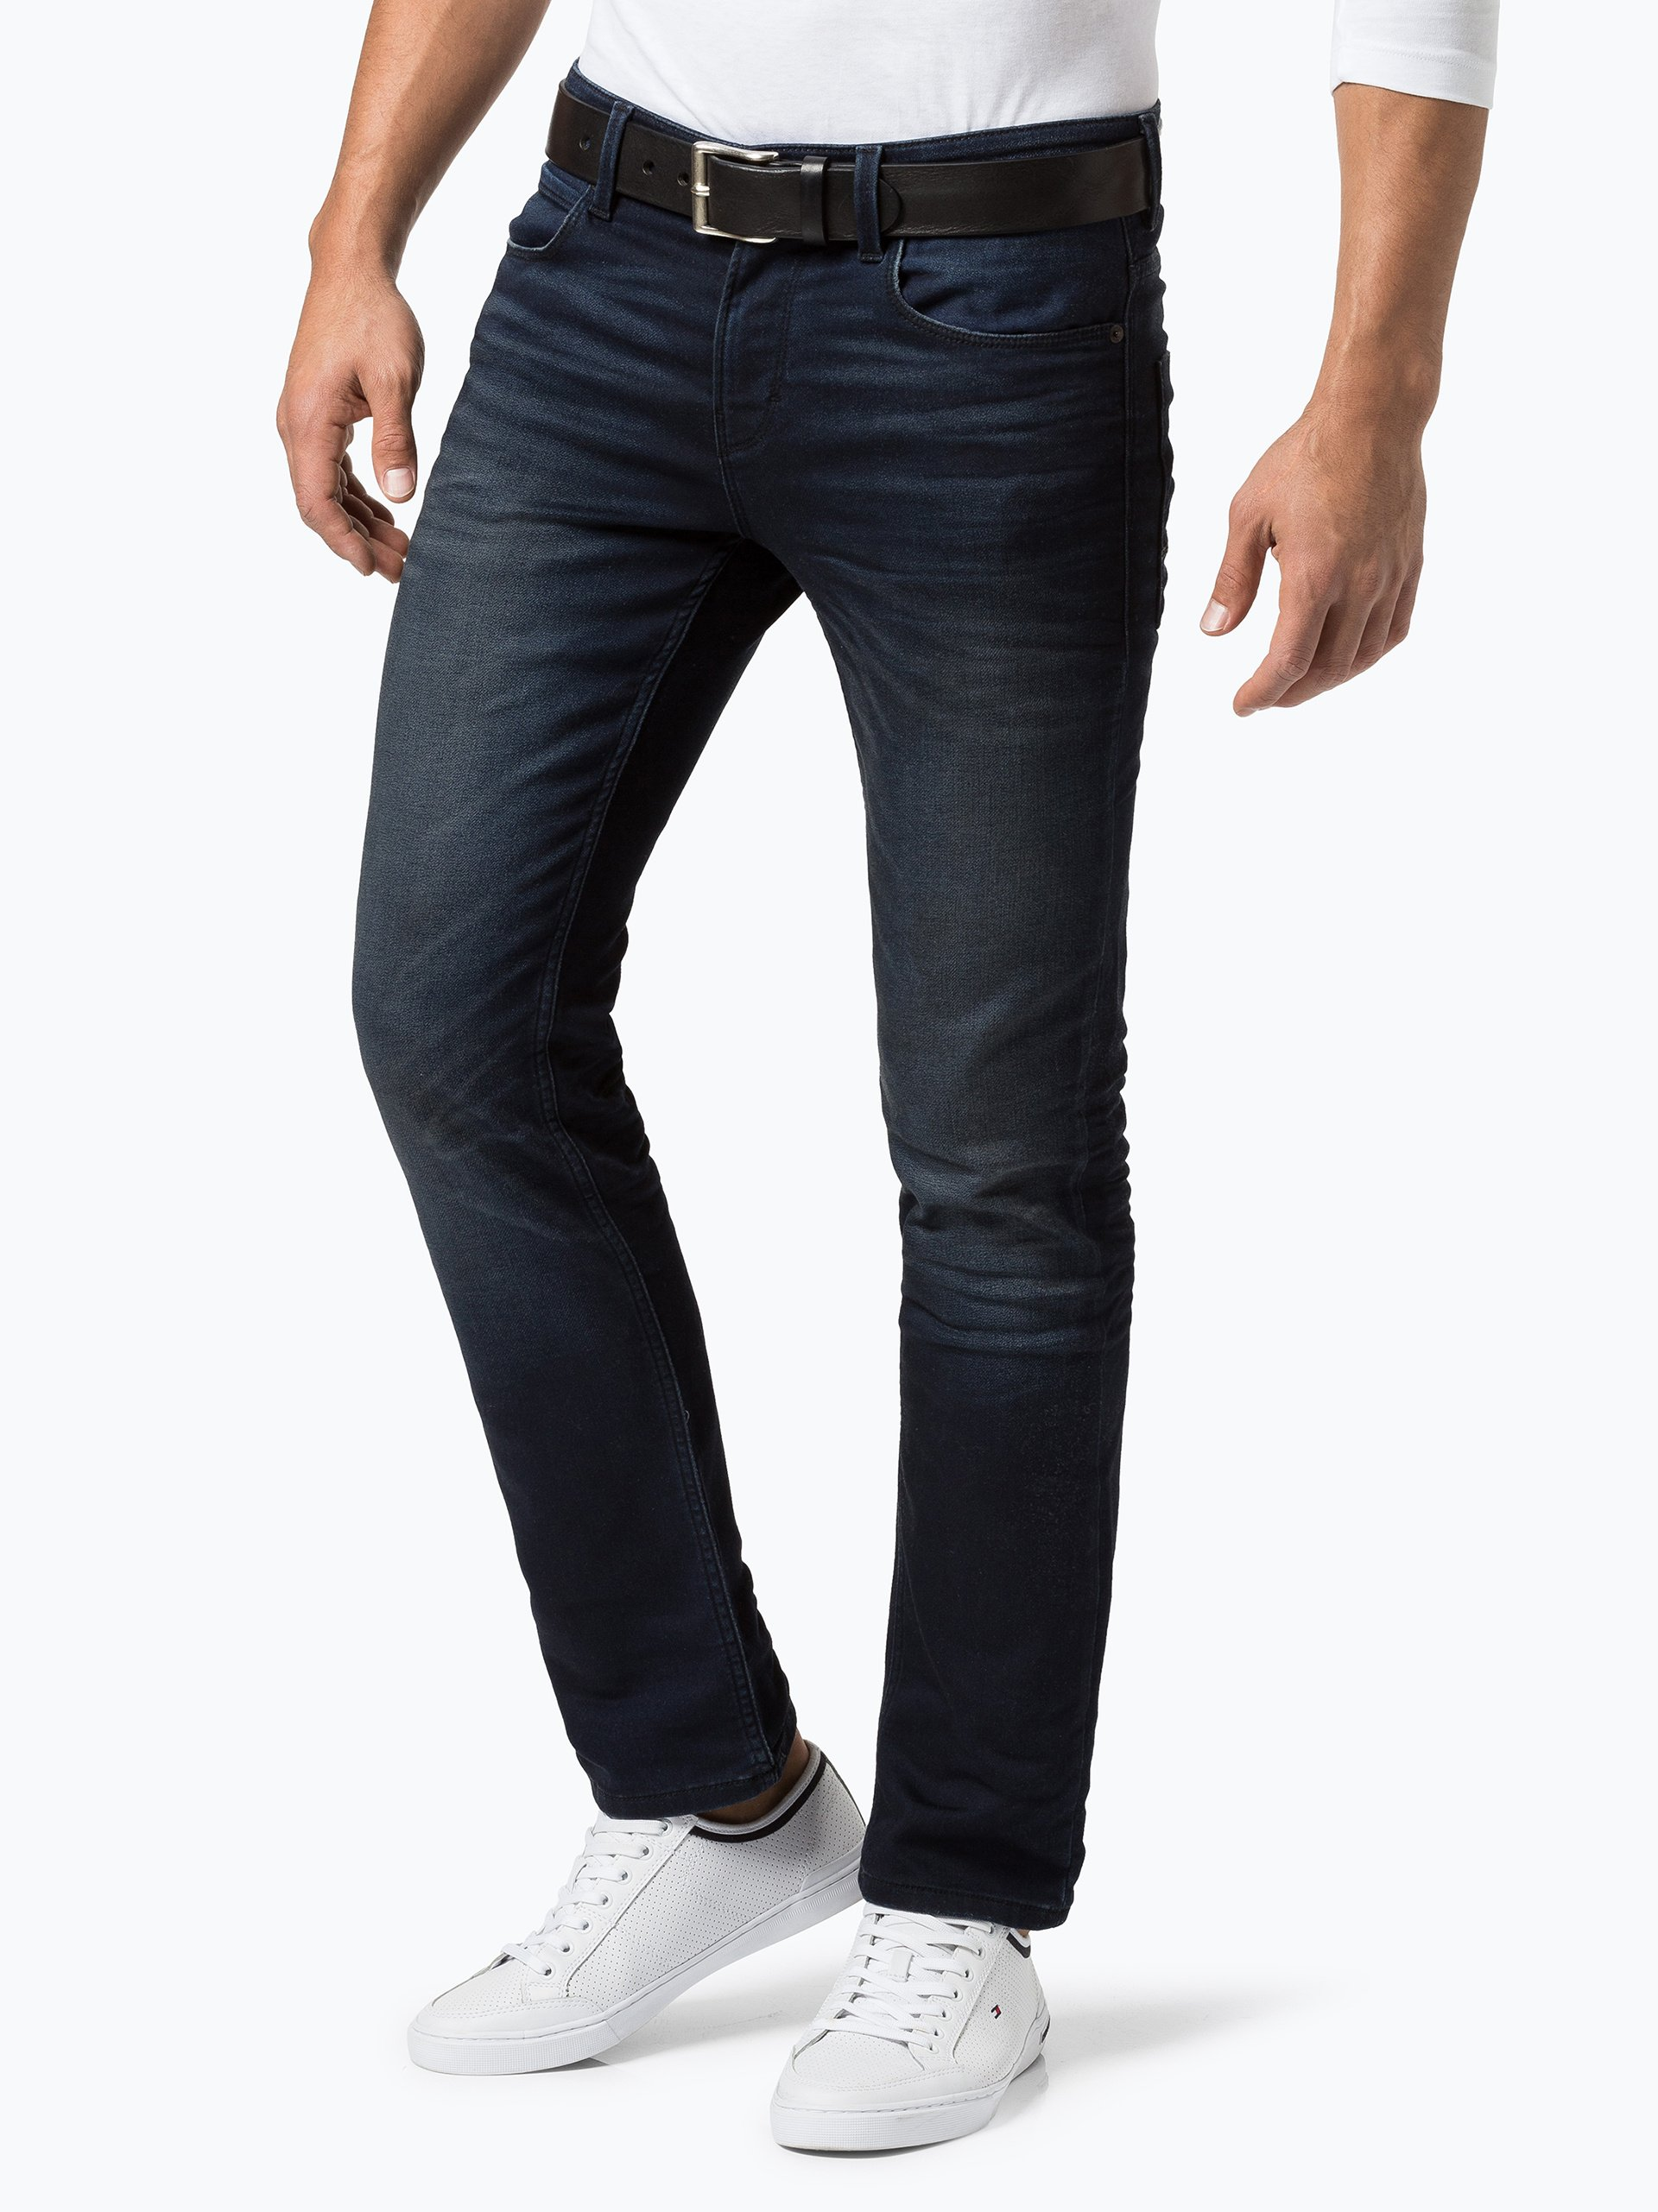 boss orange herren jeans dimension blue stone uni online kaufen peek und cloppenburg de. Black Bedroom Furniture Sets. Home Design Ideas